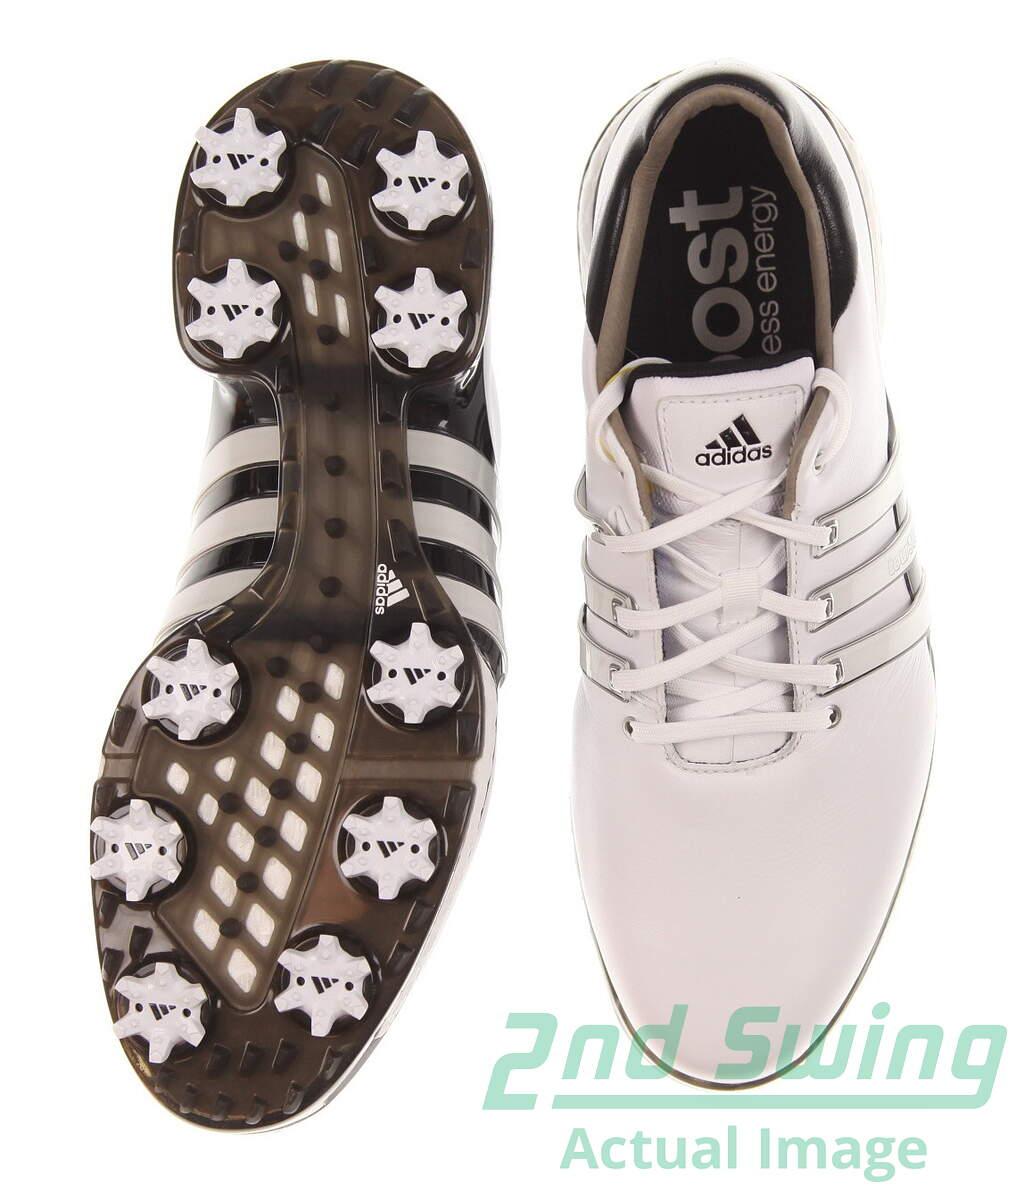 New Mens Golf Shoe Adidas Tour 360 Boost 2 0 Wide 9 5 White Black Msrp 200 Golf Footwear 2nd Swing Golf